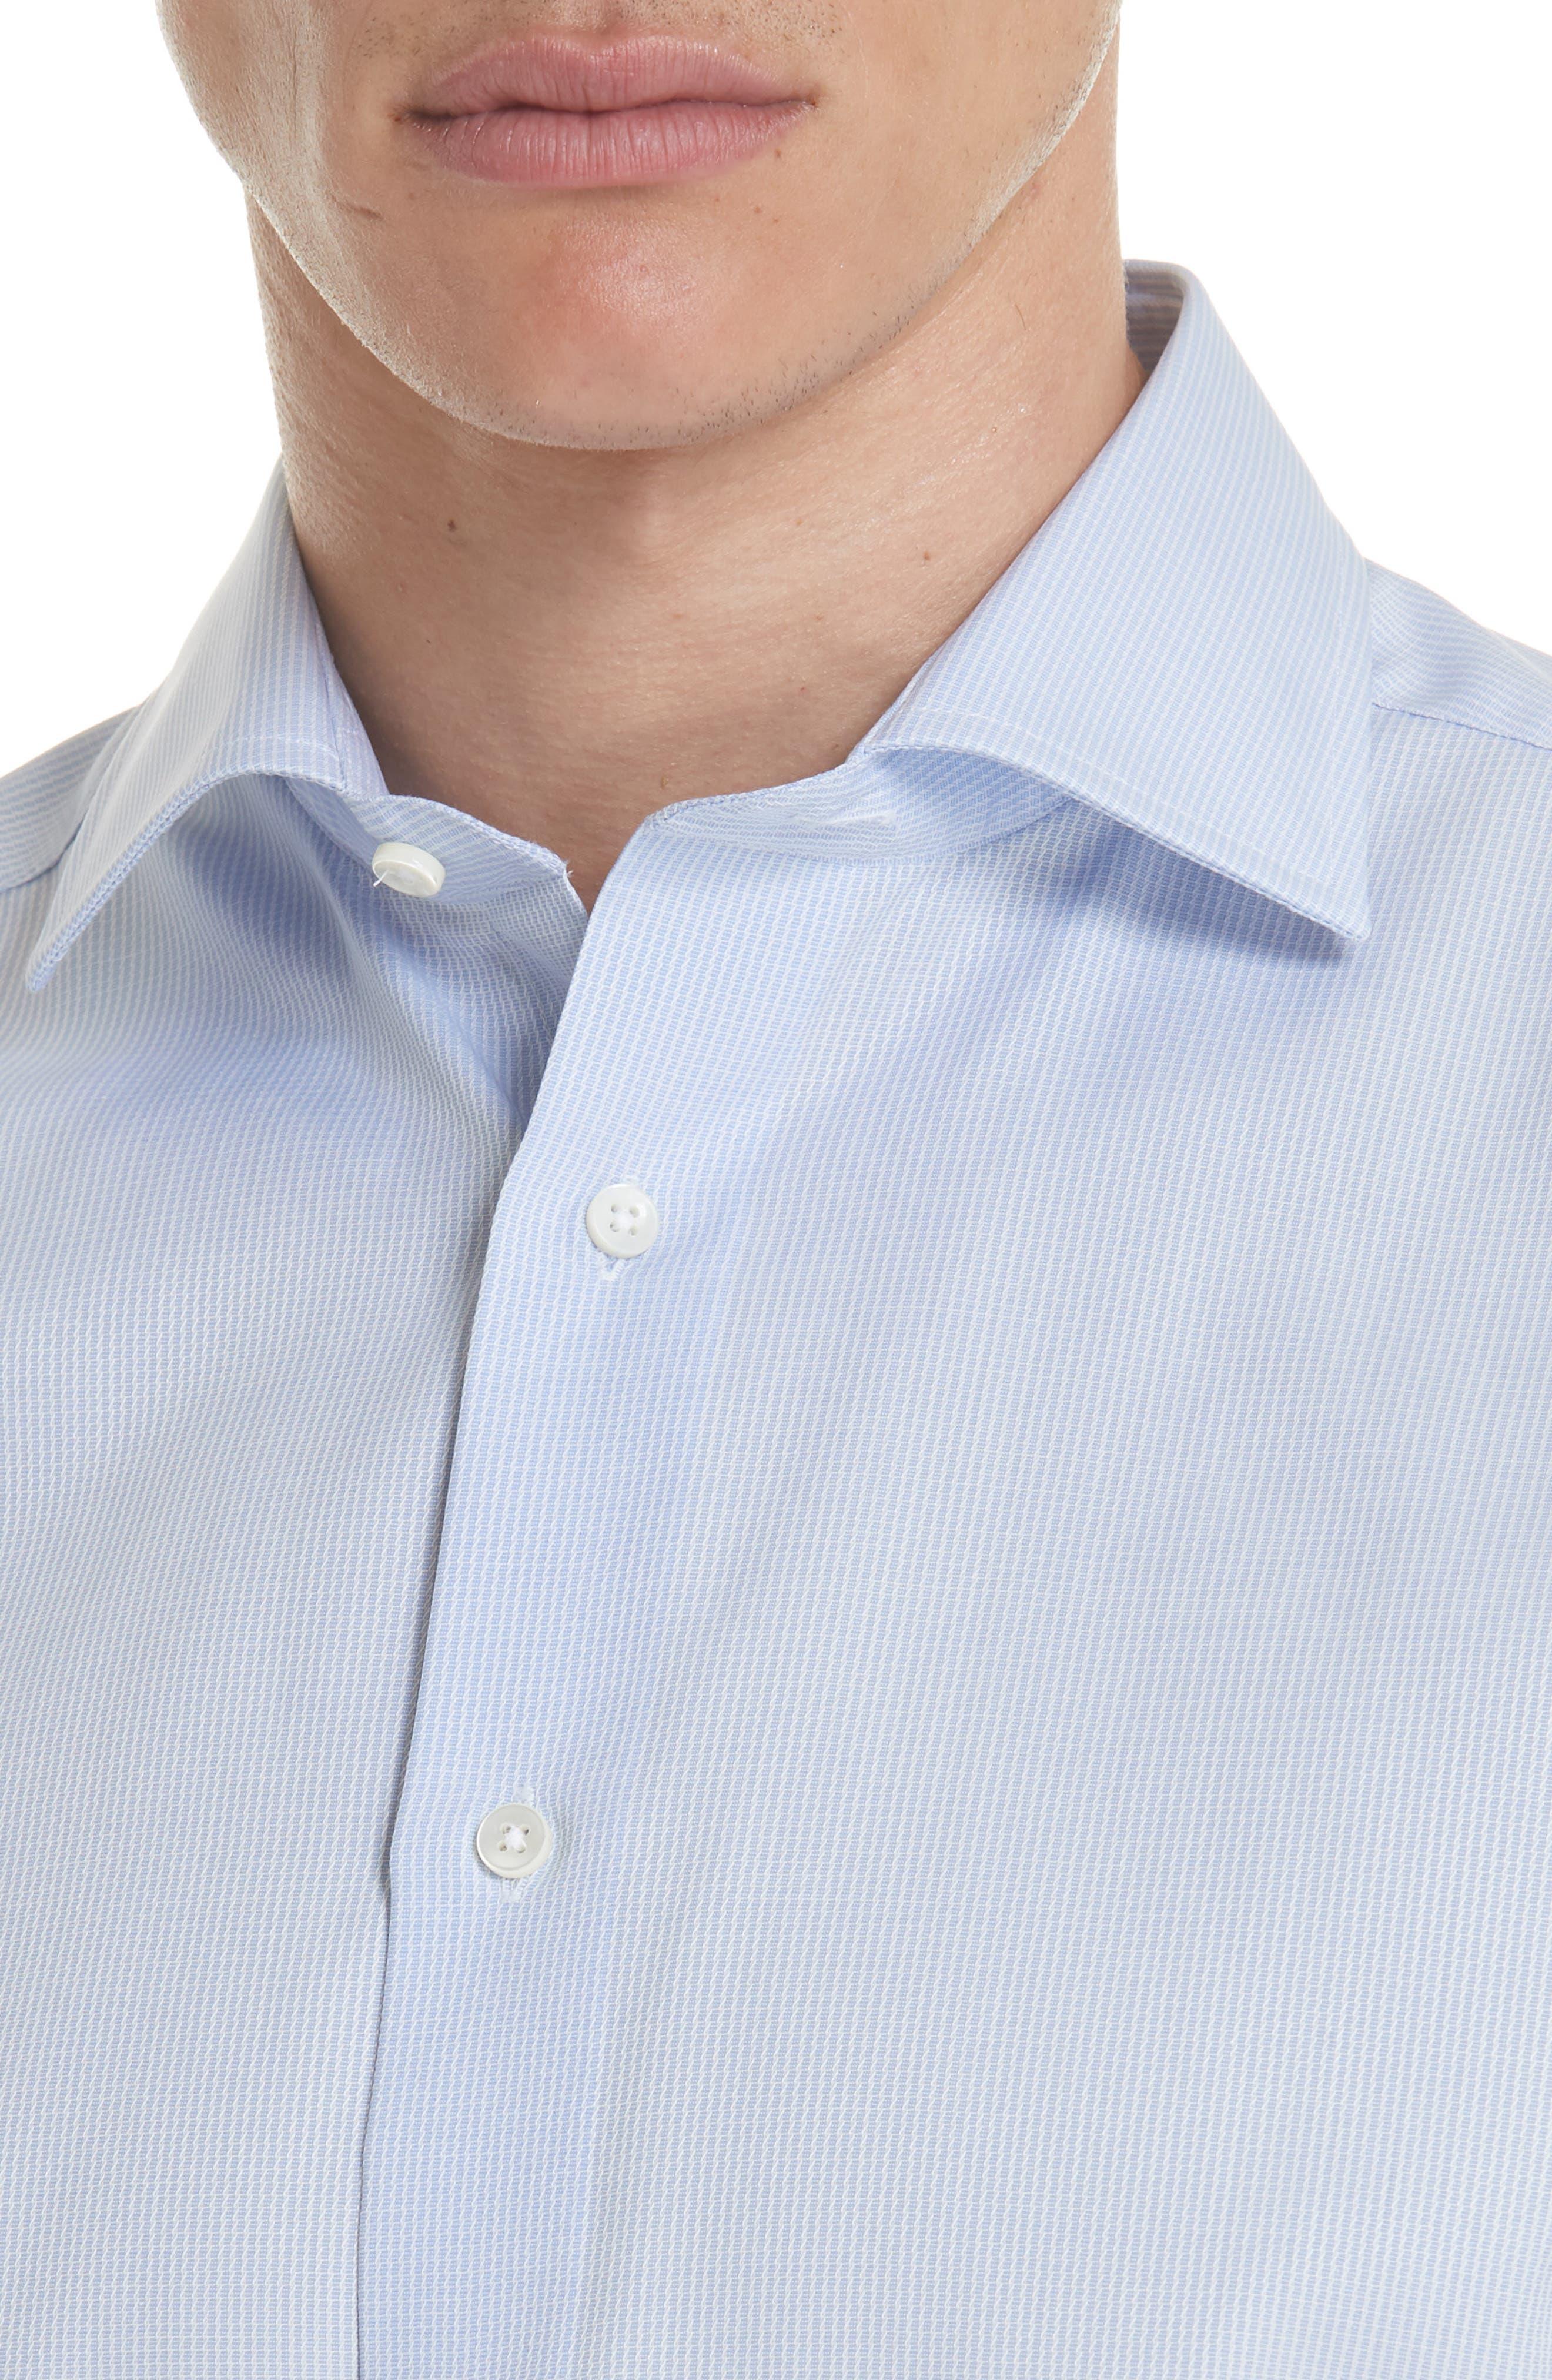 Regular Fit Print Dress Shirt,                             Alternate thumbnail 2, color,                             Blue